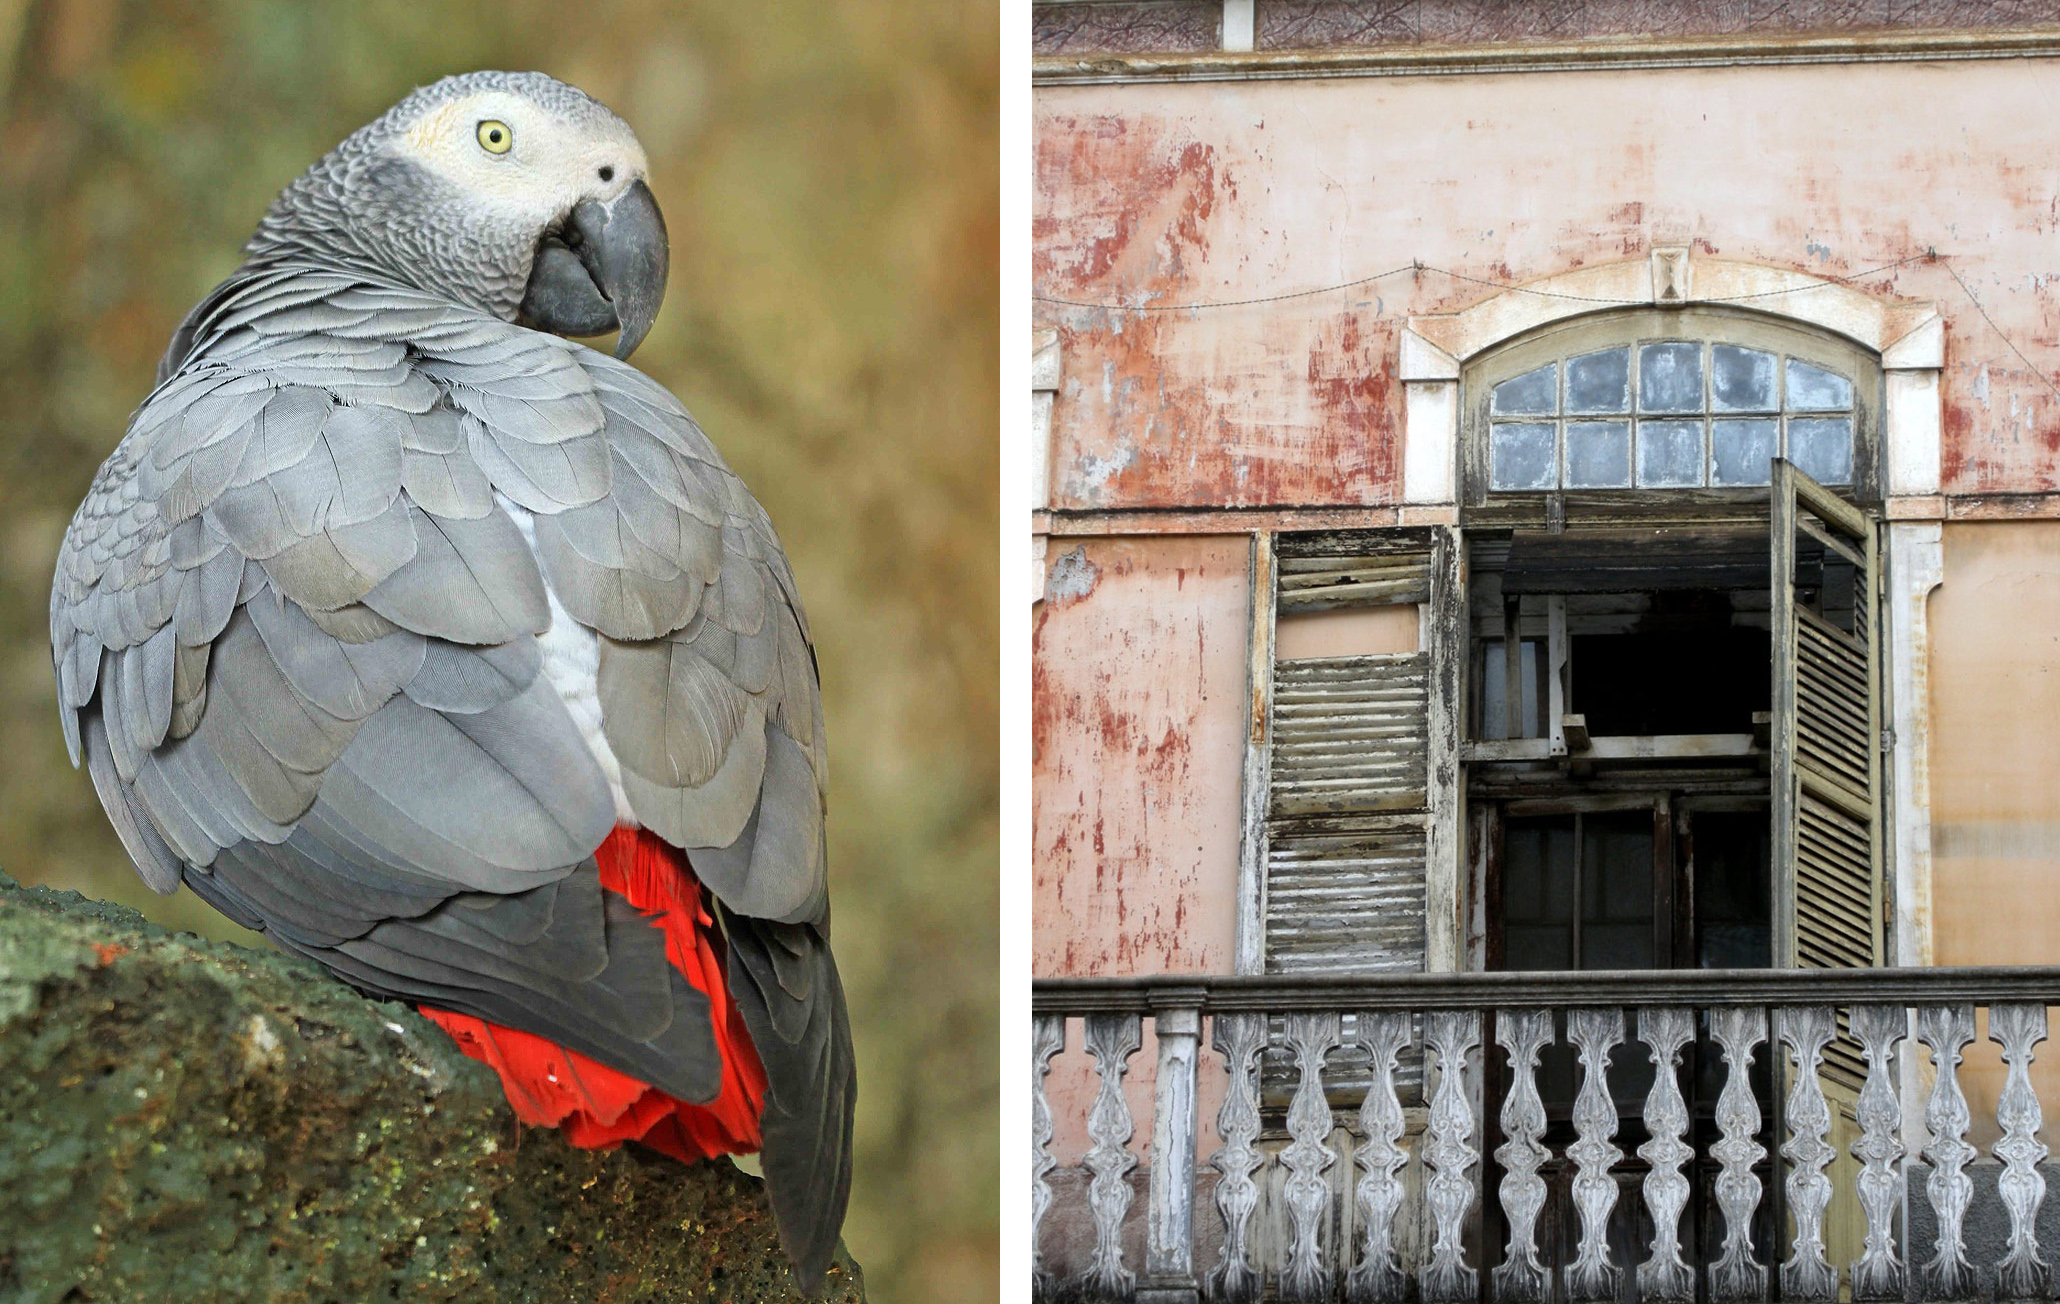 Principe-Gray-Parrot and balcony -Christian-Boix